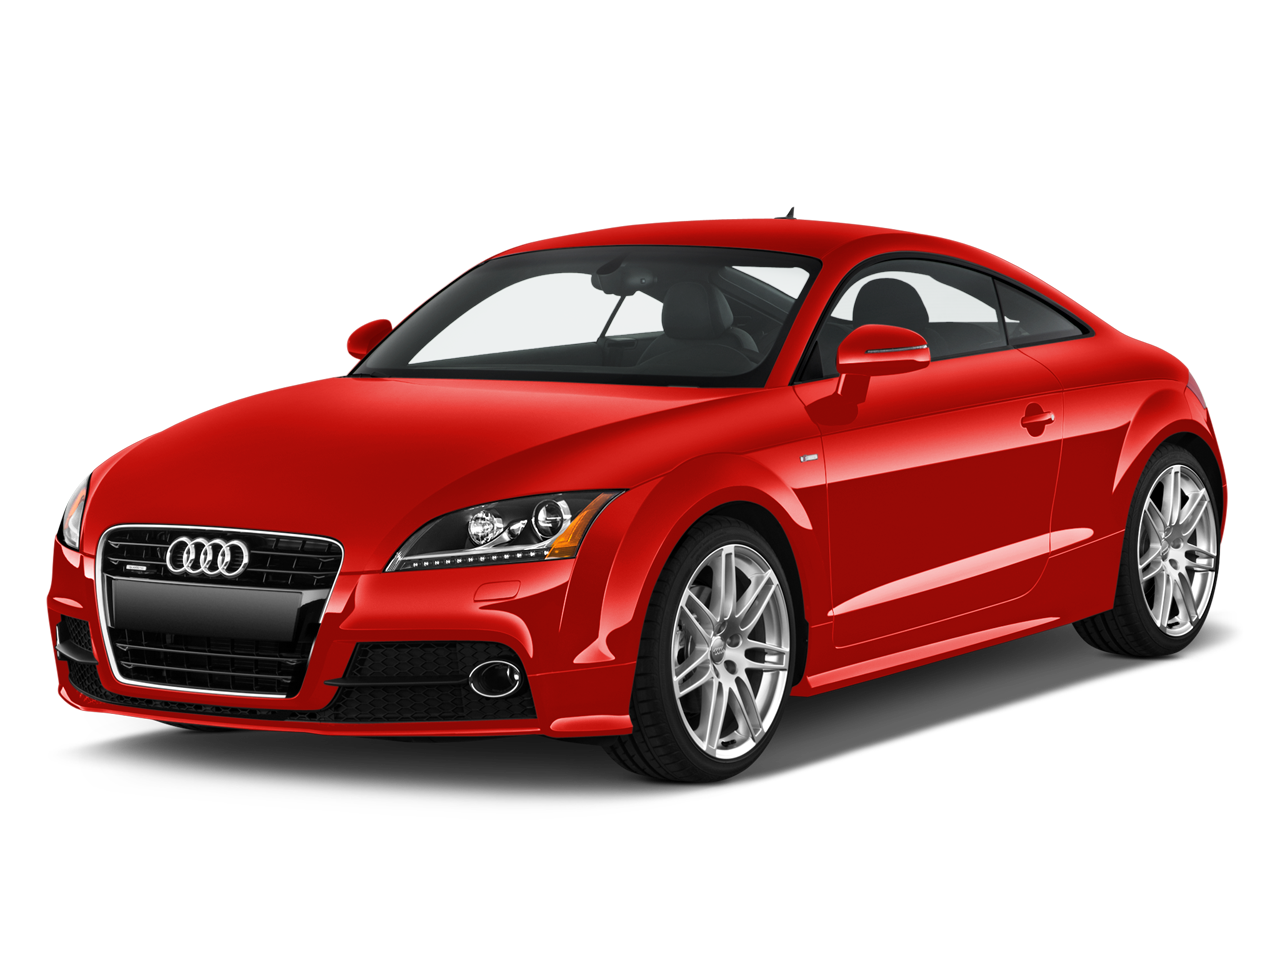 Audi auto free download. Car png images